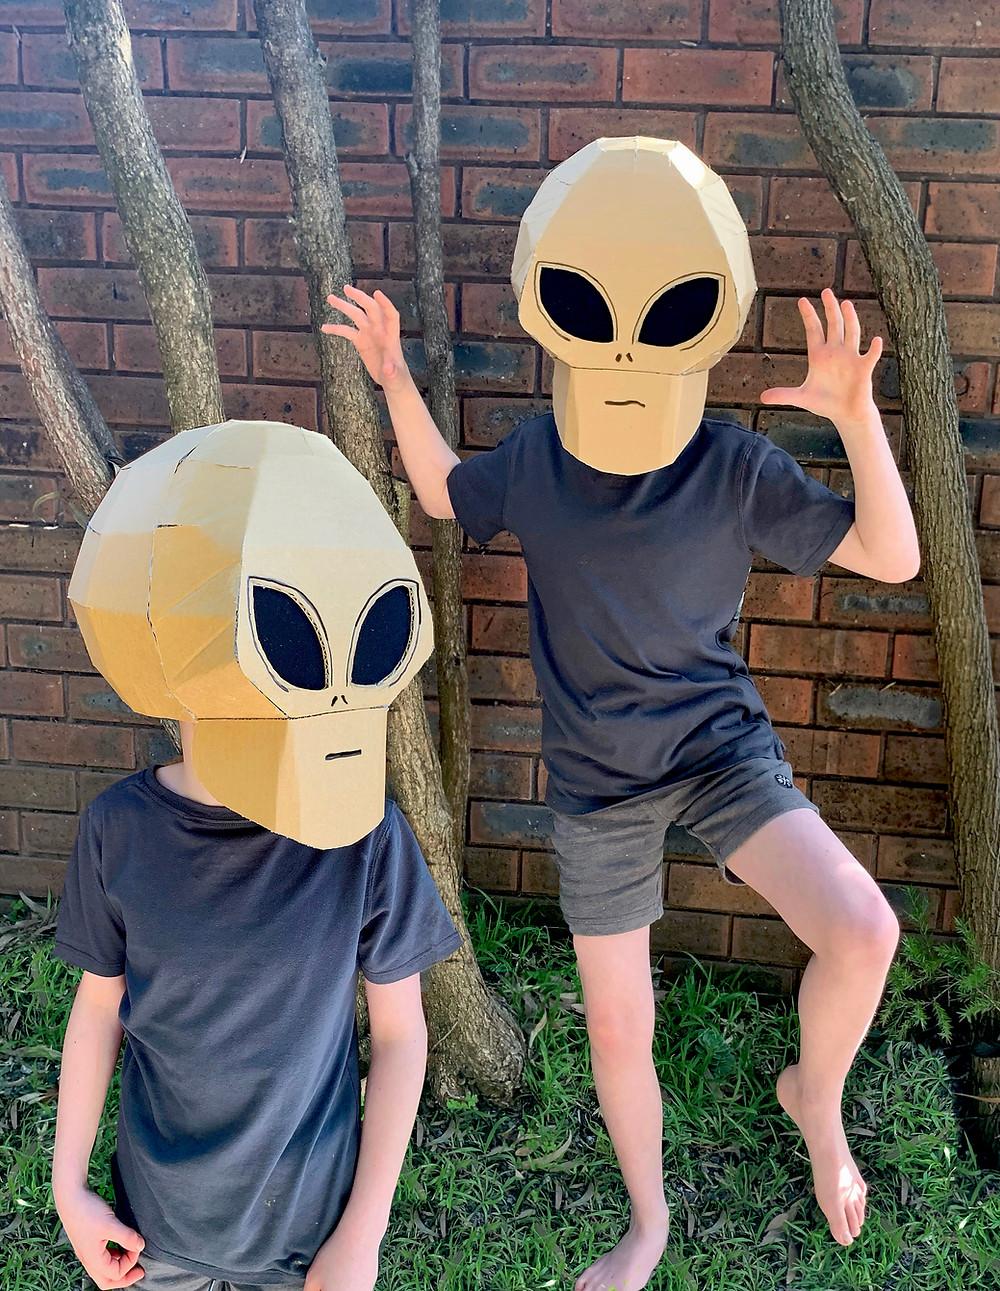 DIY Cardboard Alien mask costume for Halloween